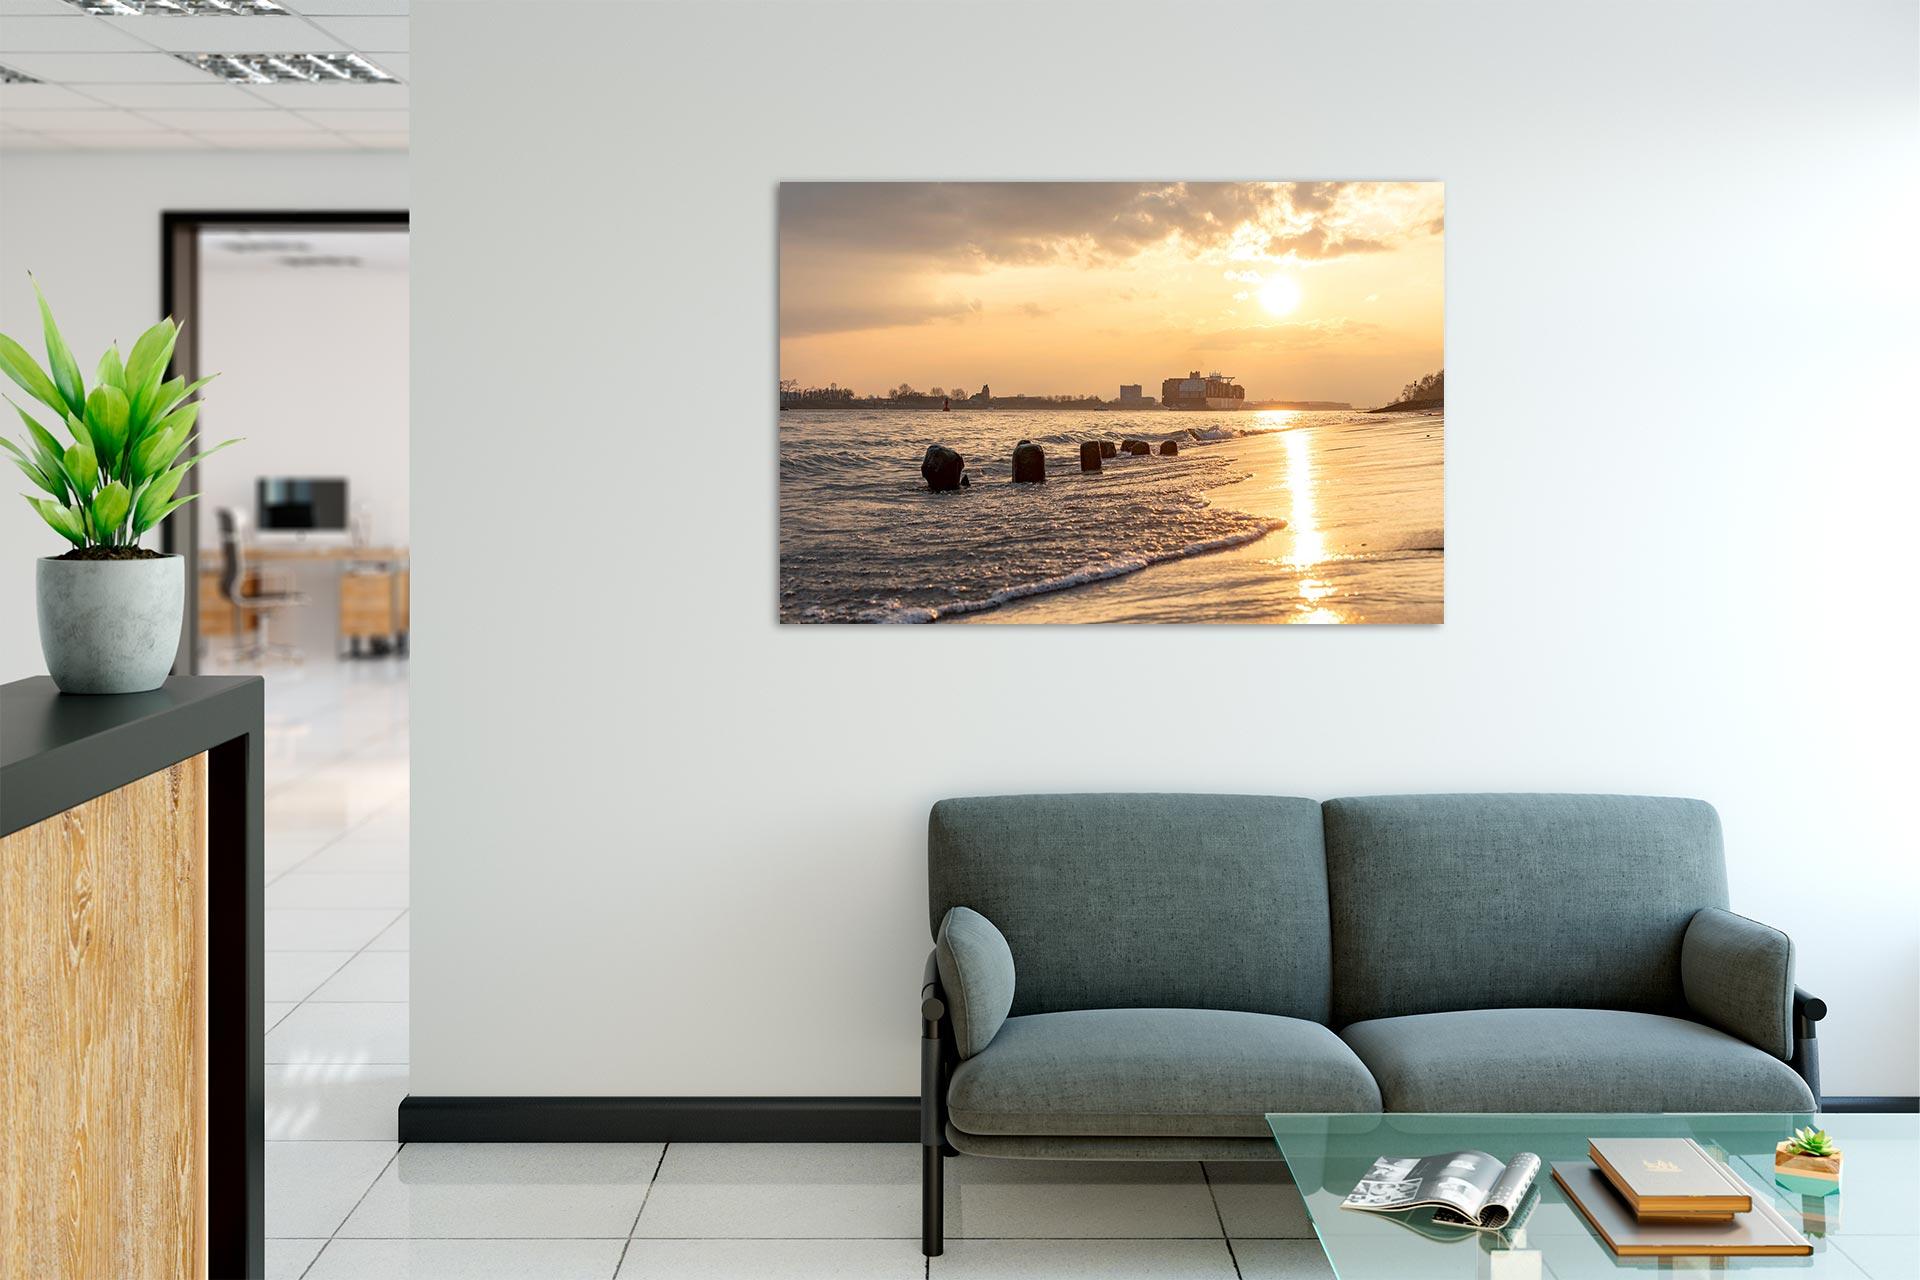 NL084-sommerabend-elbe-hamburg-wandbild-bild-auf-leinwand-acrylglas-aludibond-empfang